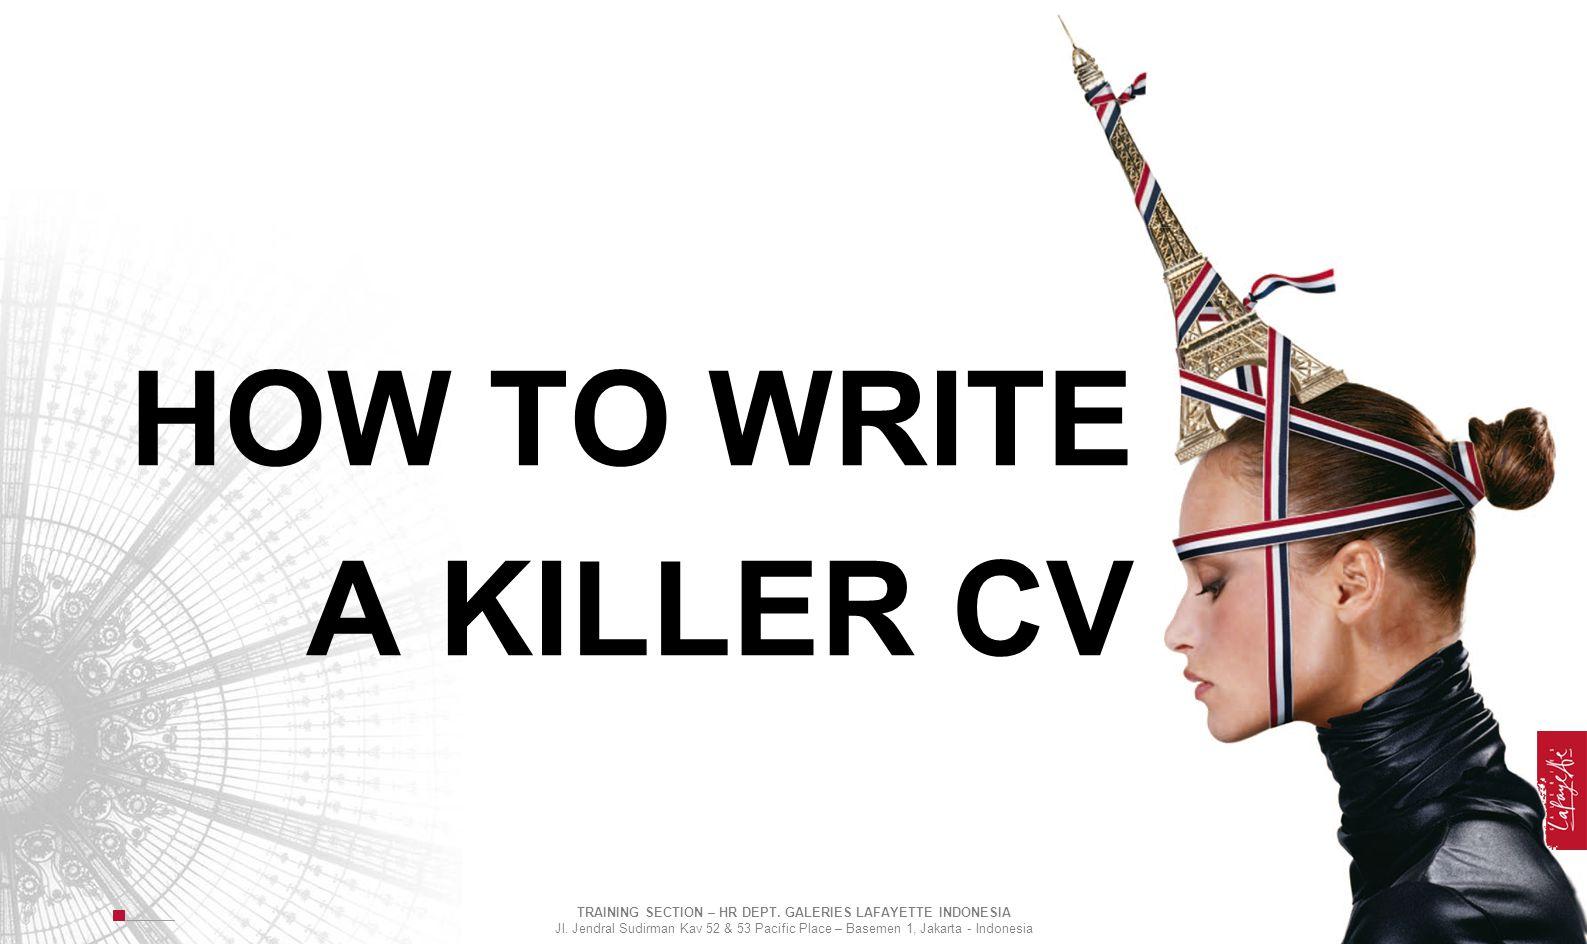 HOW TO WRITE A KILLER CV TRAINING SECTION – HR DEPT. GALERIES LAFAYETTE INDONESIA Jl. Jendral Sudirman Kav 52 & 53 Pacific Place – Basemen 1, Jakarta